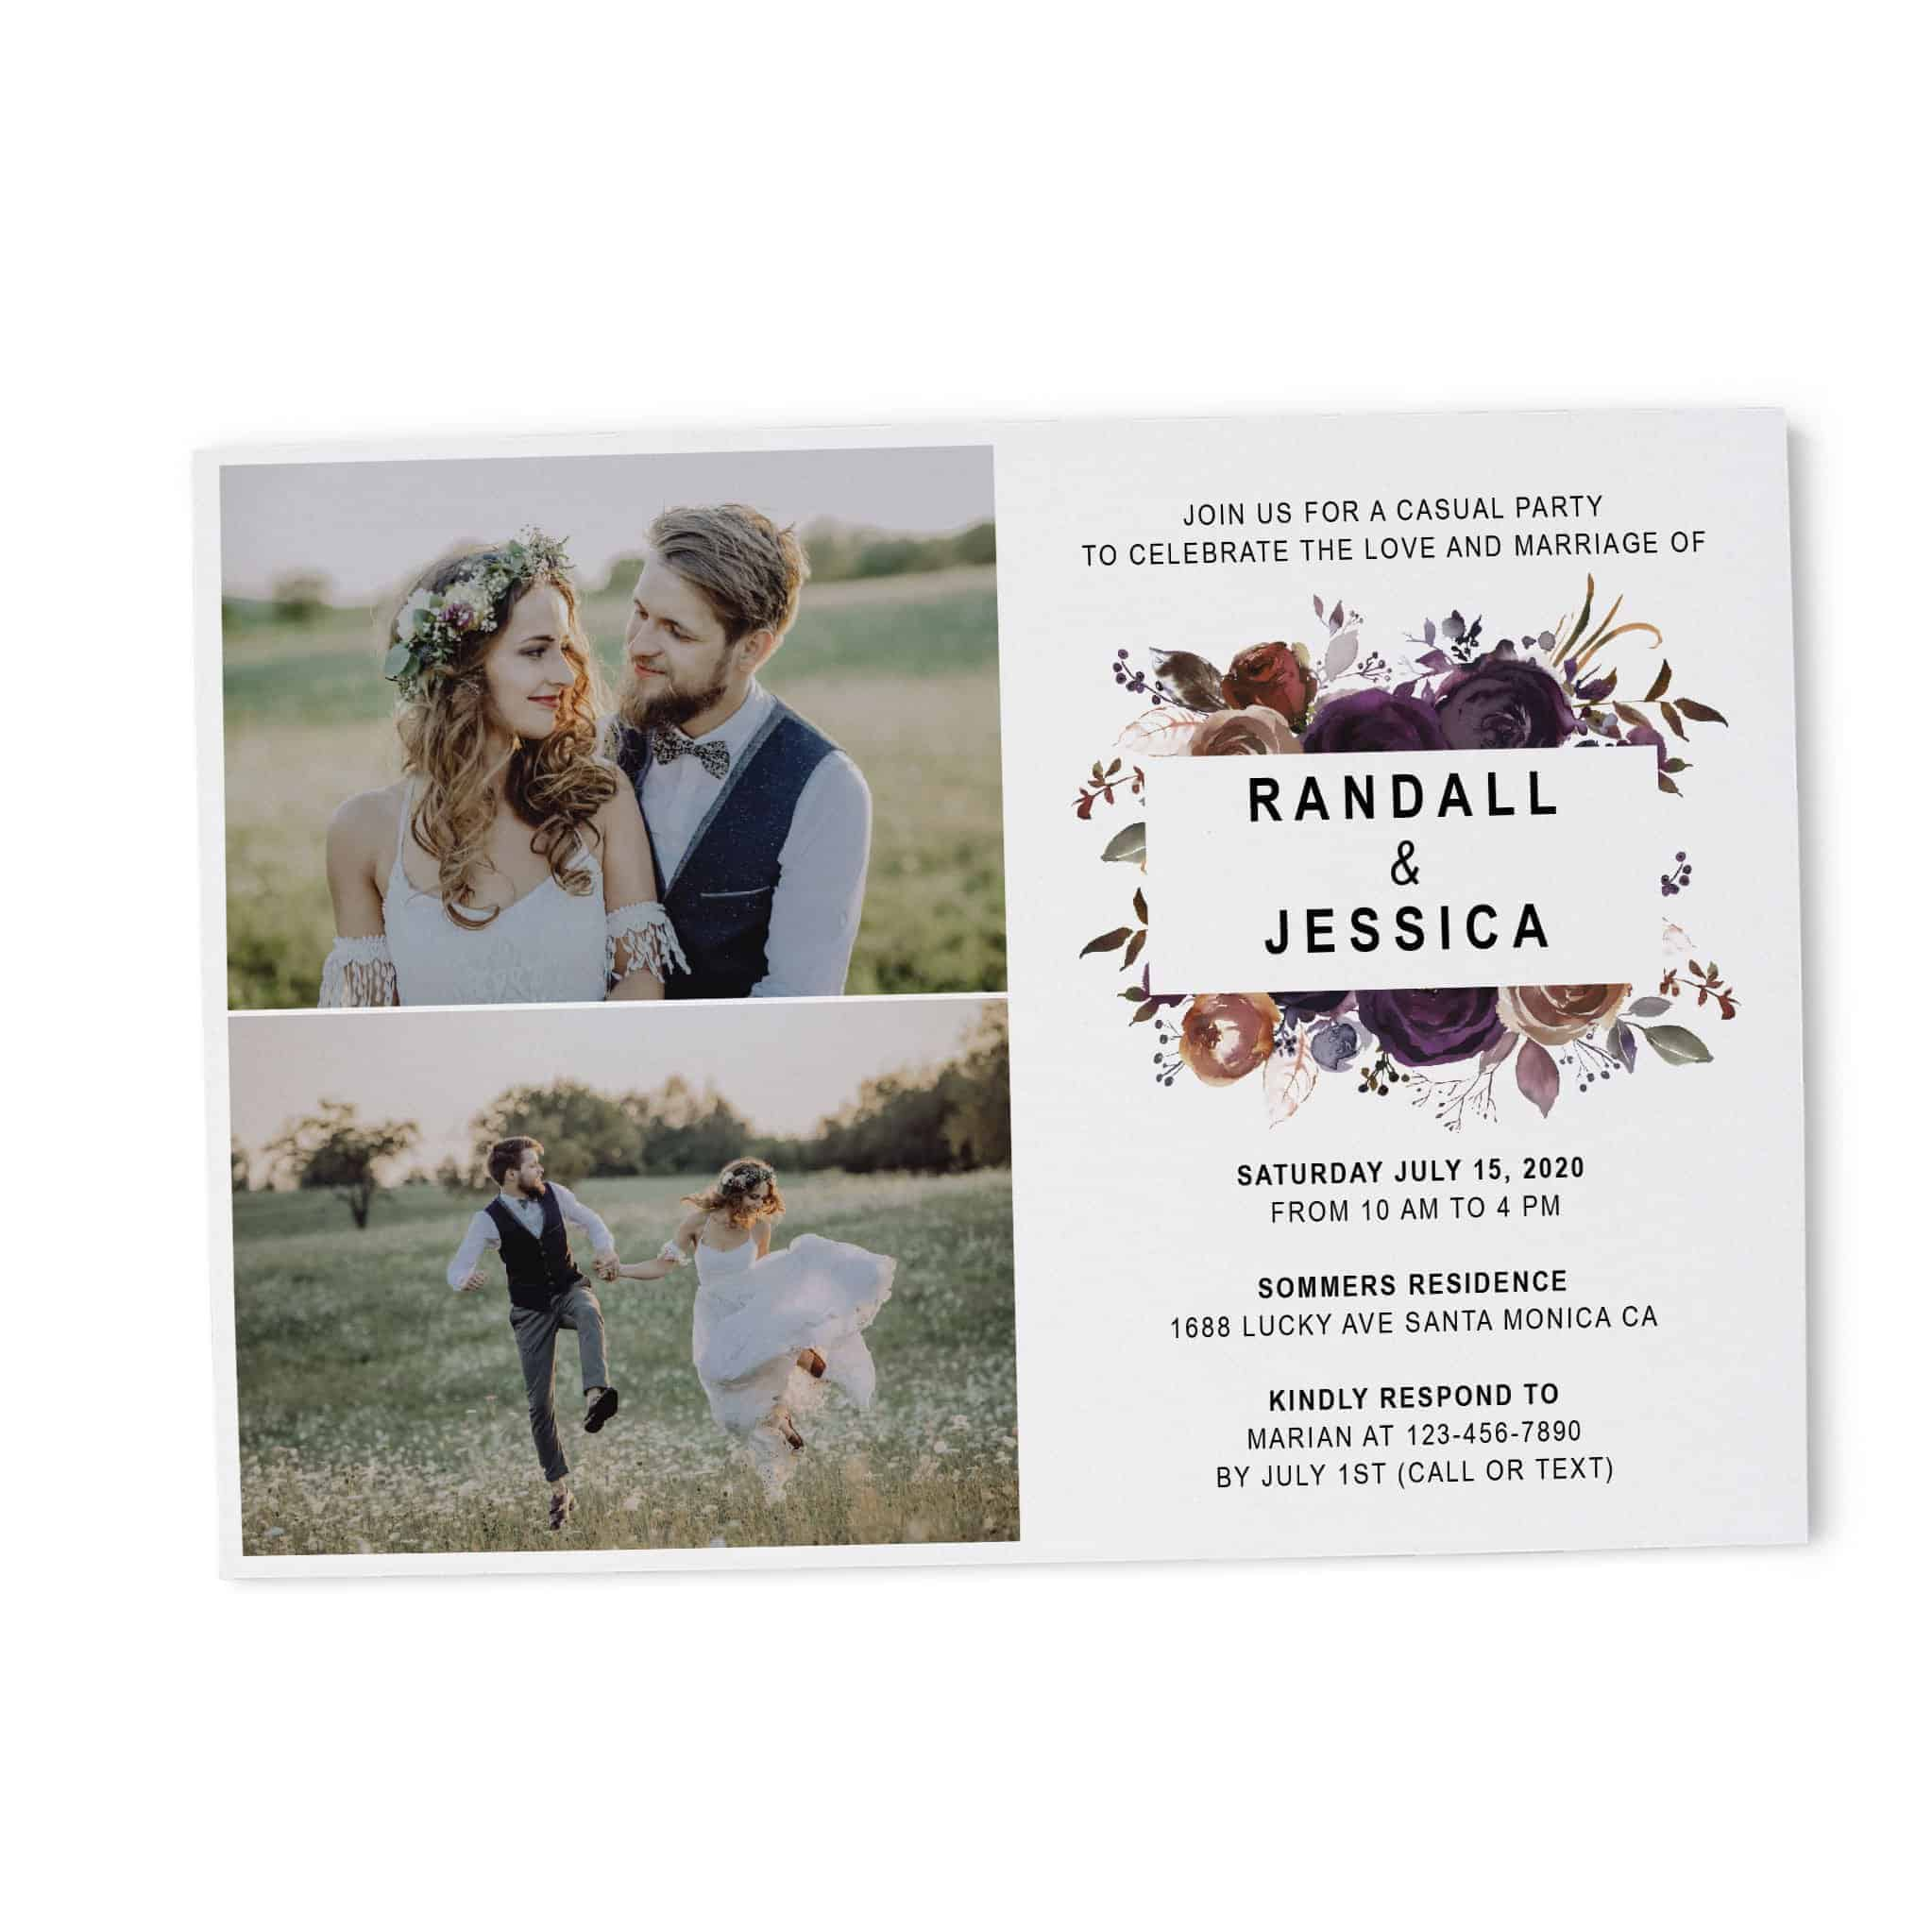 Wedding Party Invitation Photo Card, Marriage Reception Card, Inspiring Invitation Set, Beautiful Floral Theme